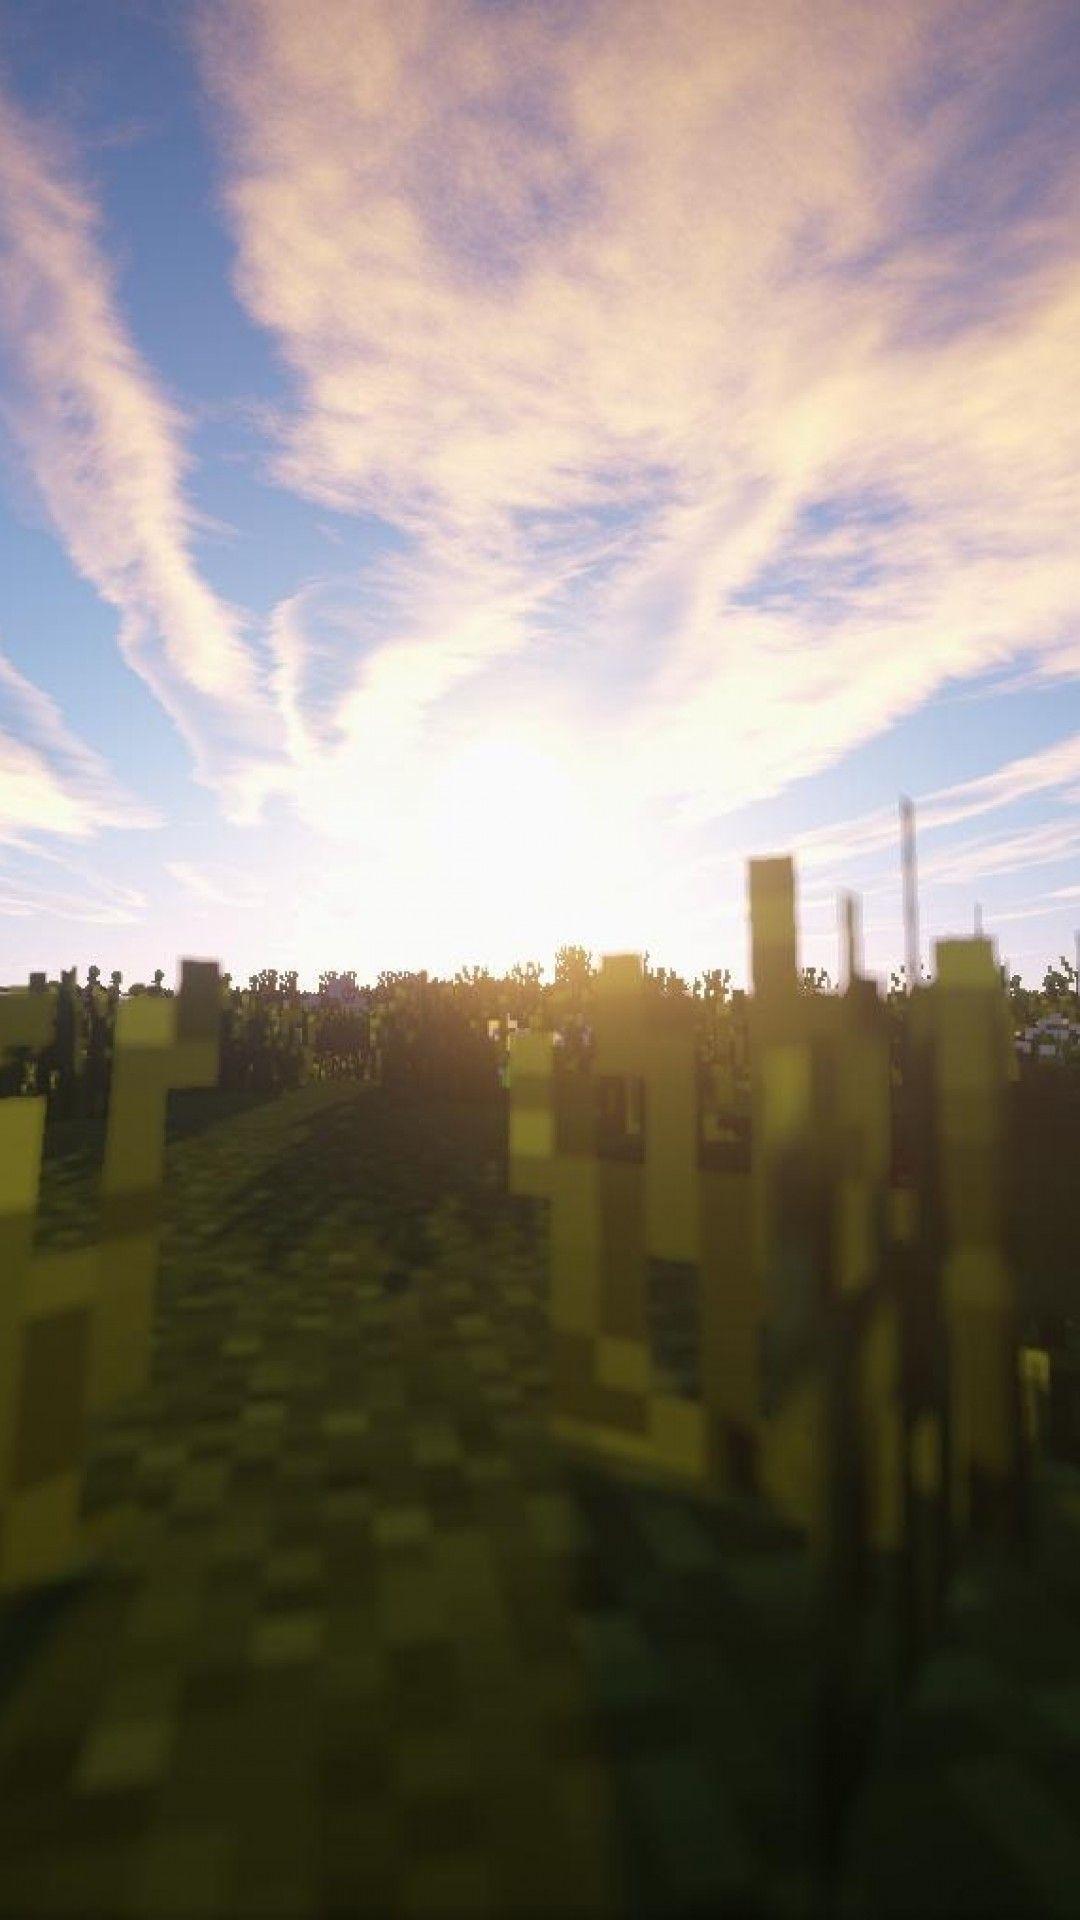 Creeper Minecraft Wallpaper Hd In 2020 Minecraft Wallpaper Creeper Minecraft Aesthetic Wallpapers